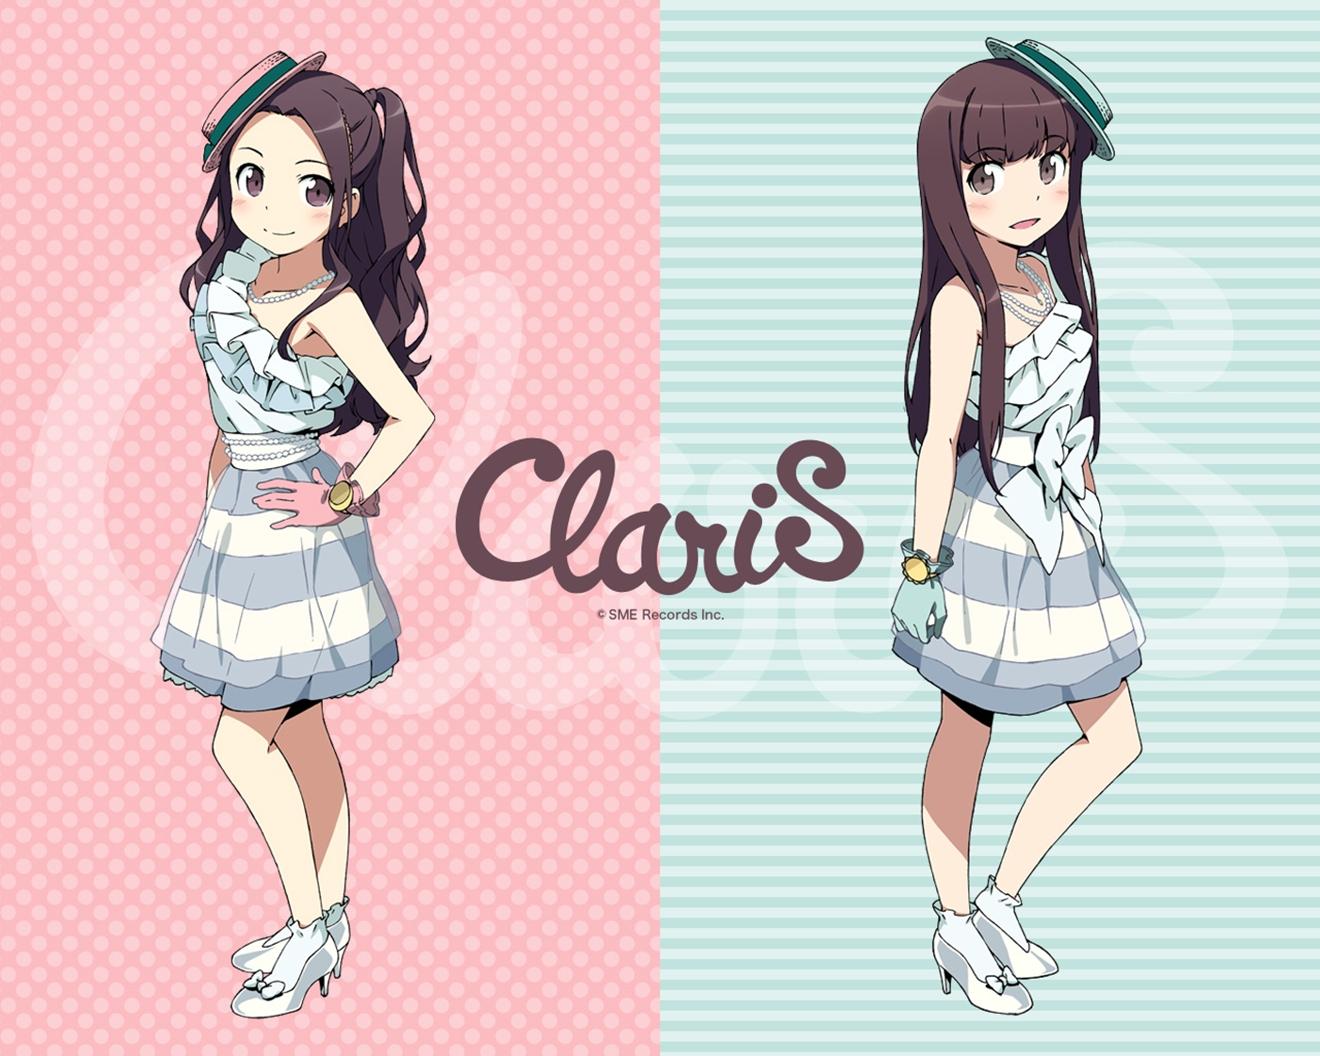 Claris anime lyrics download